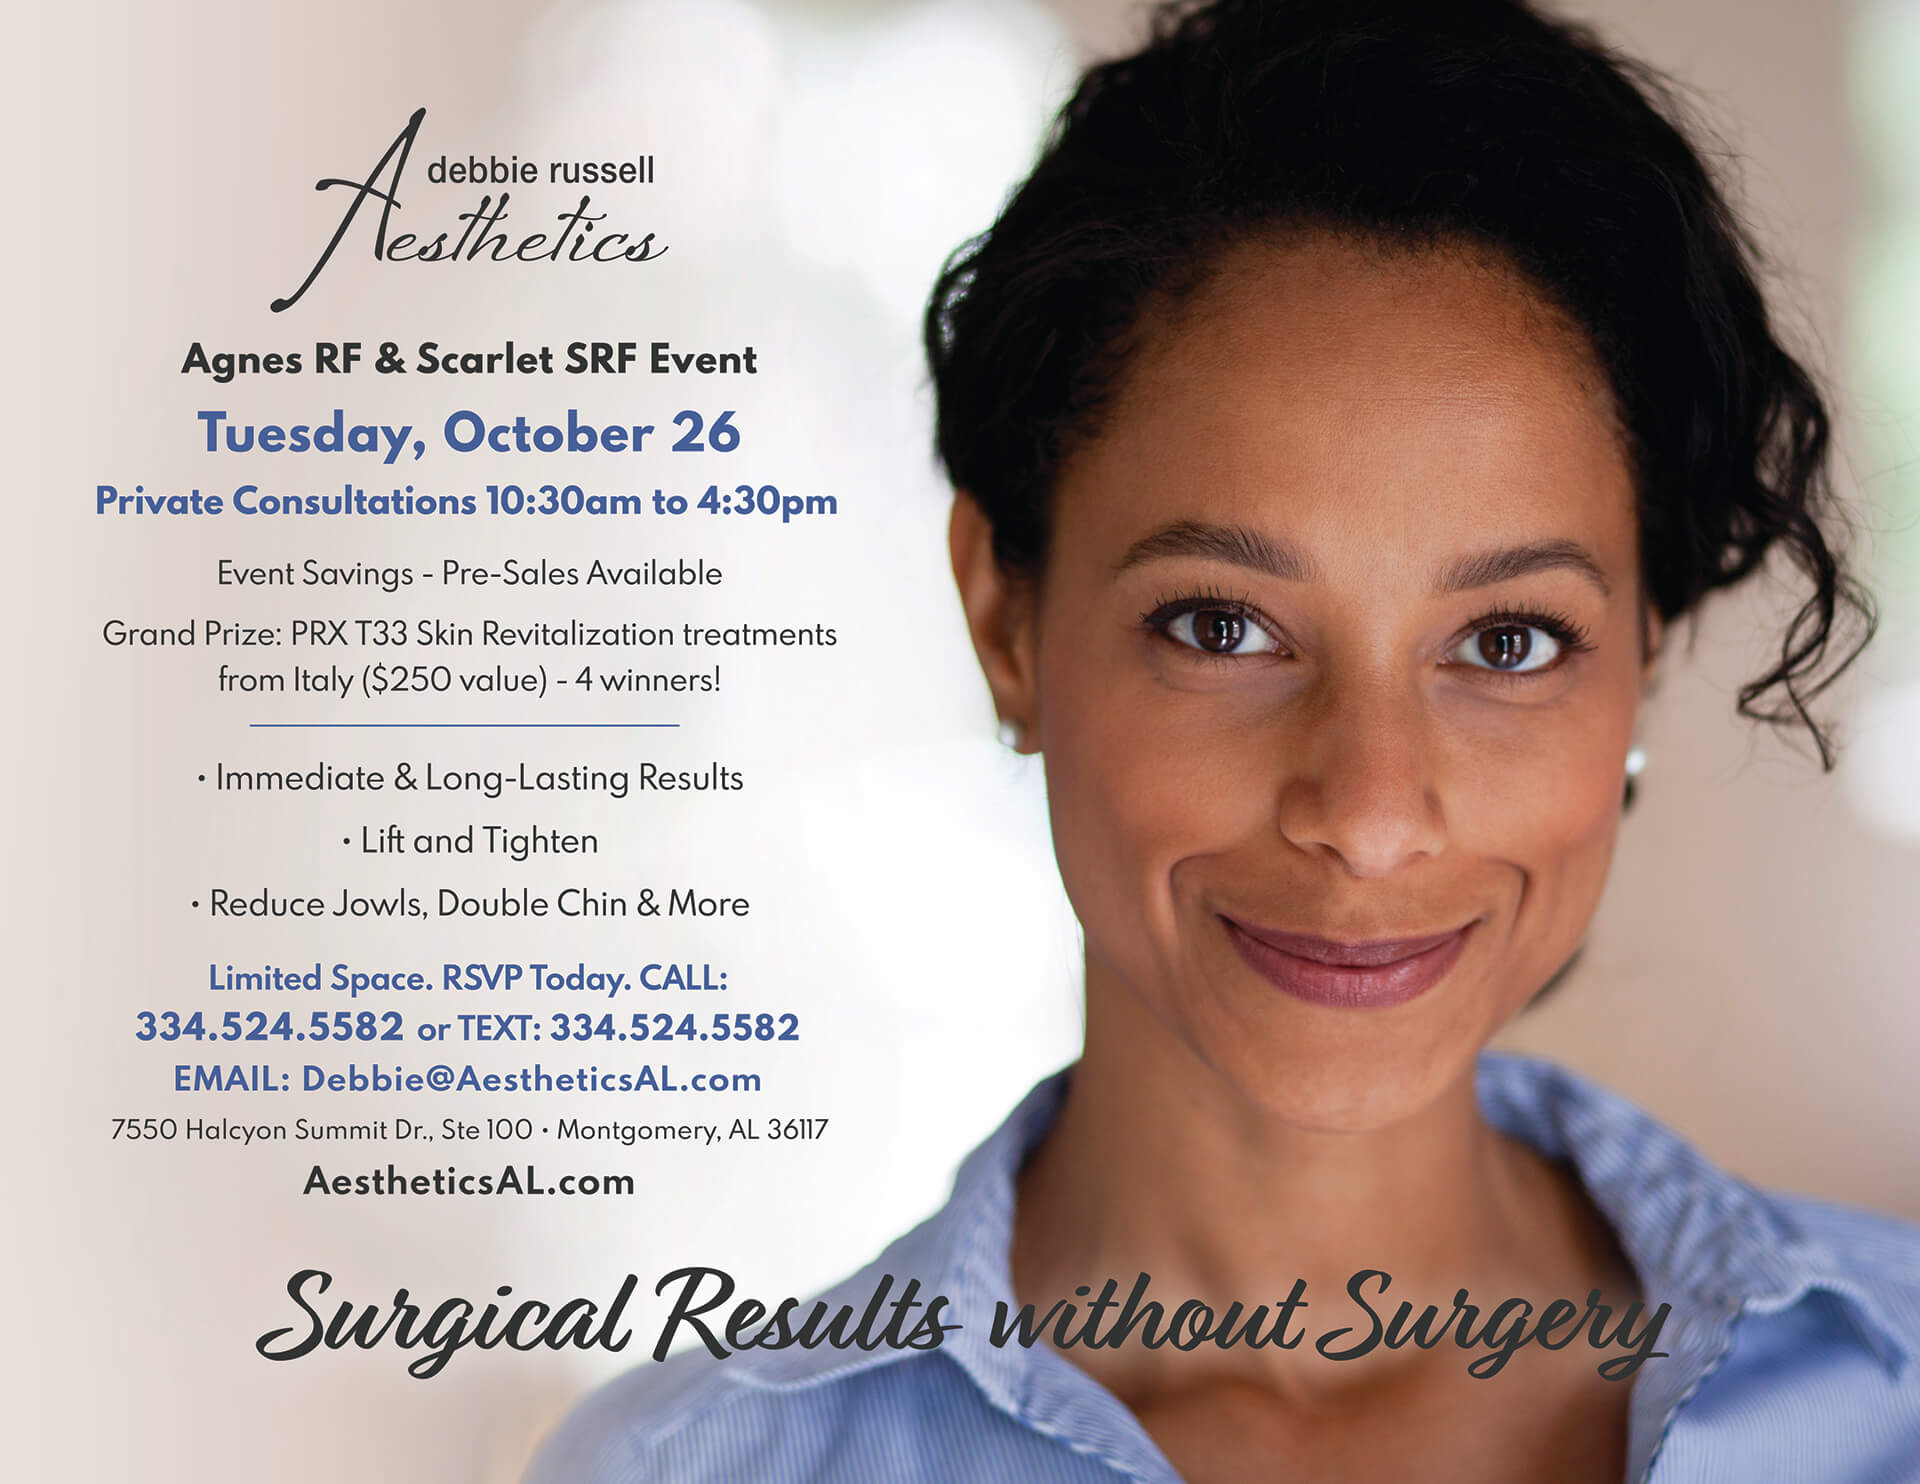 Agnes RF & Scarlet SRF Event